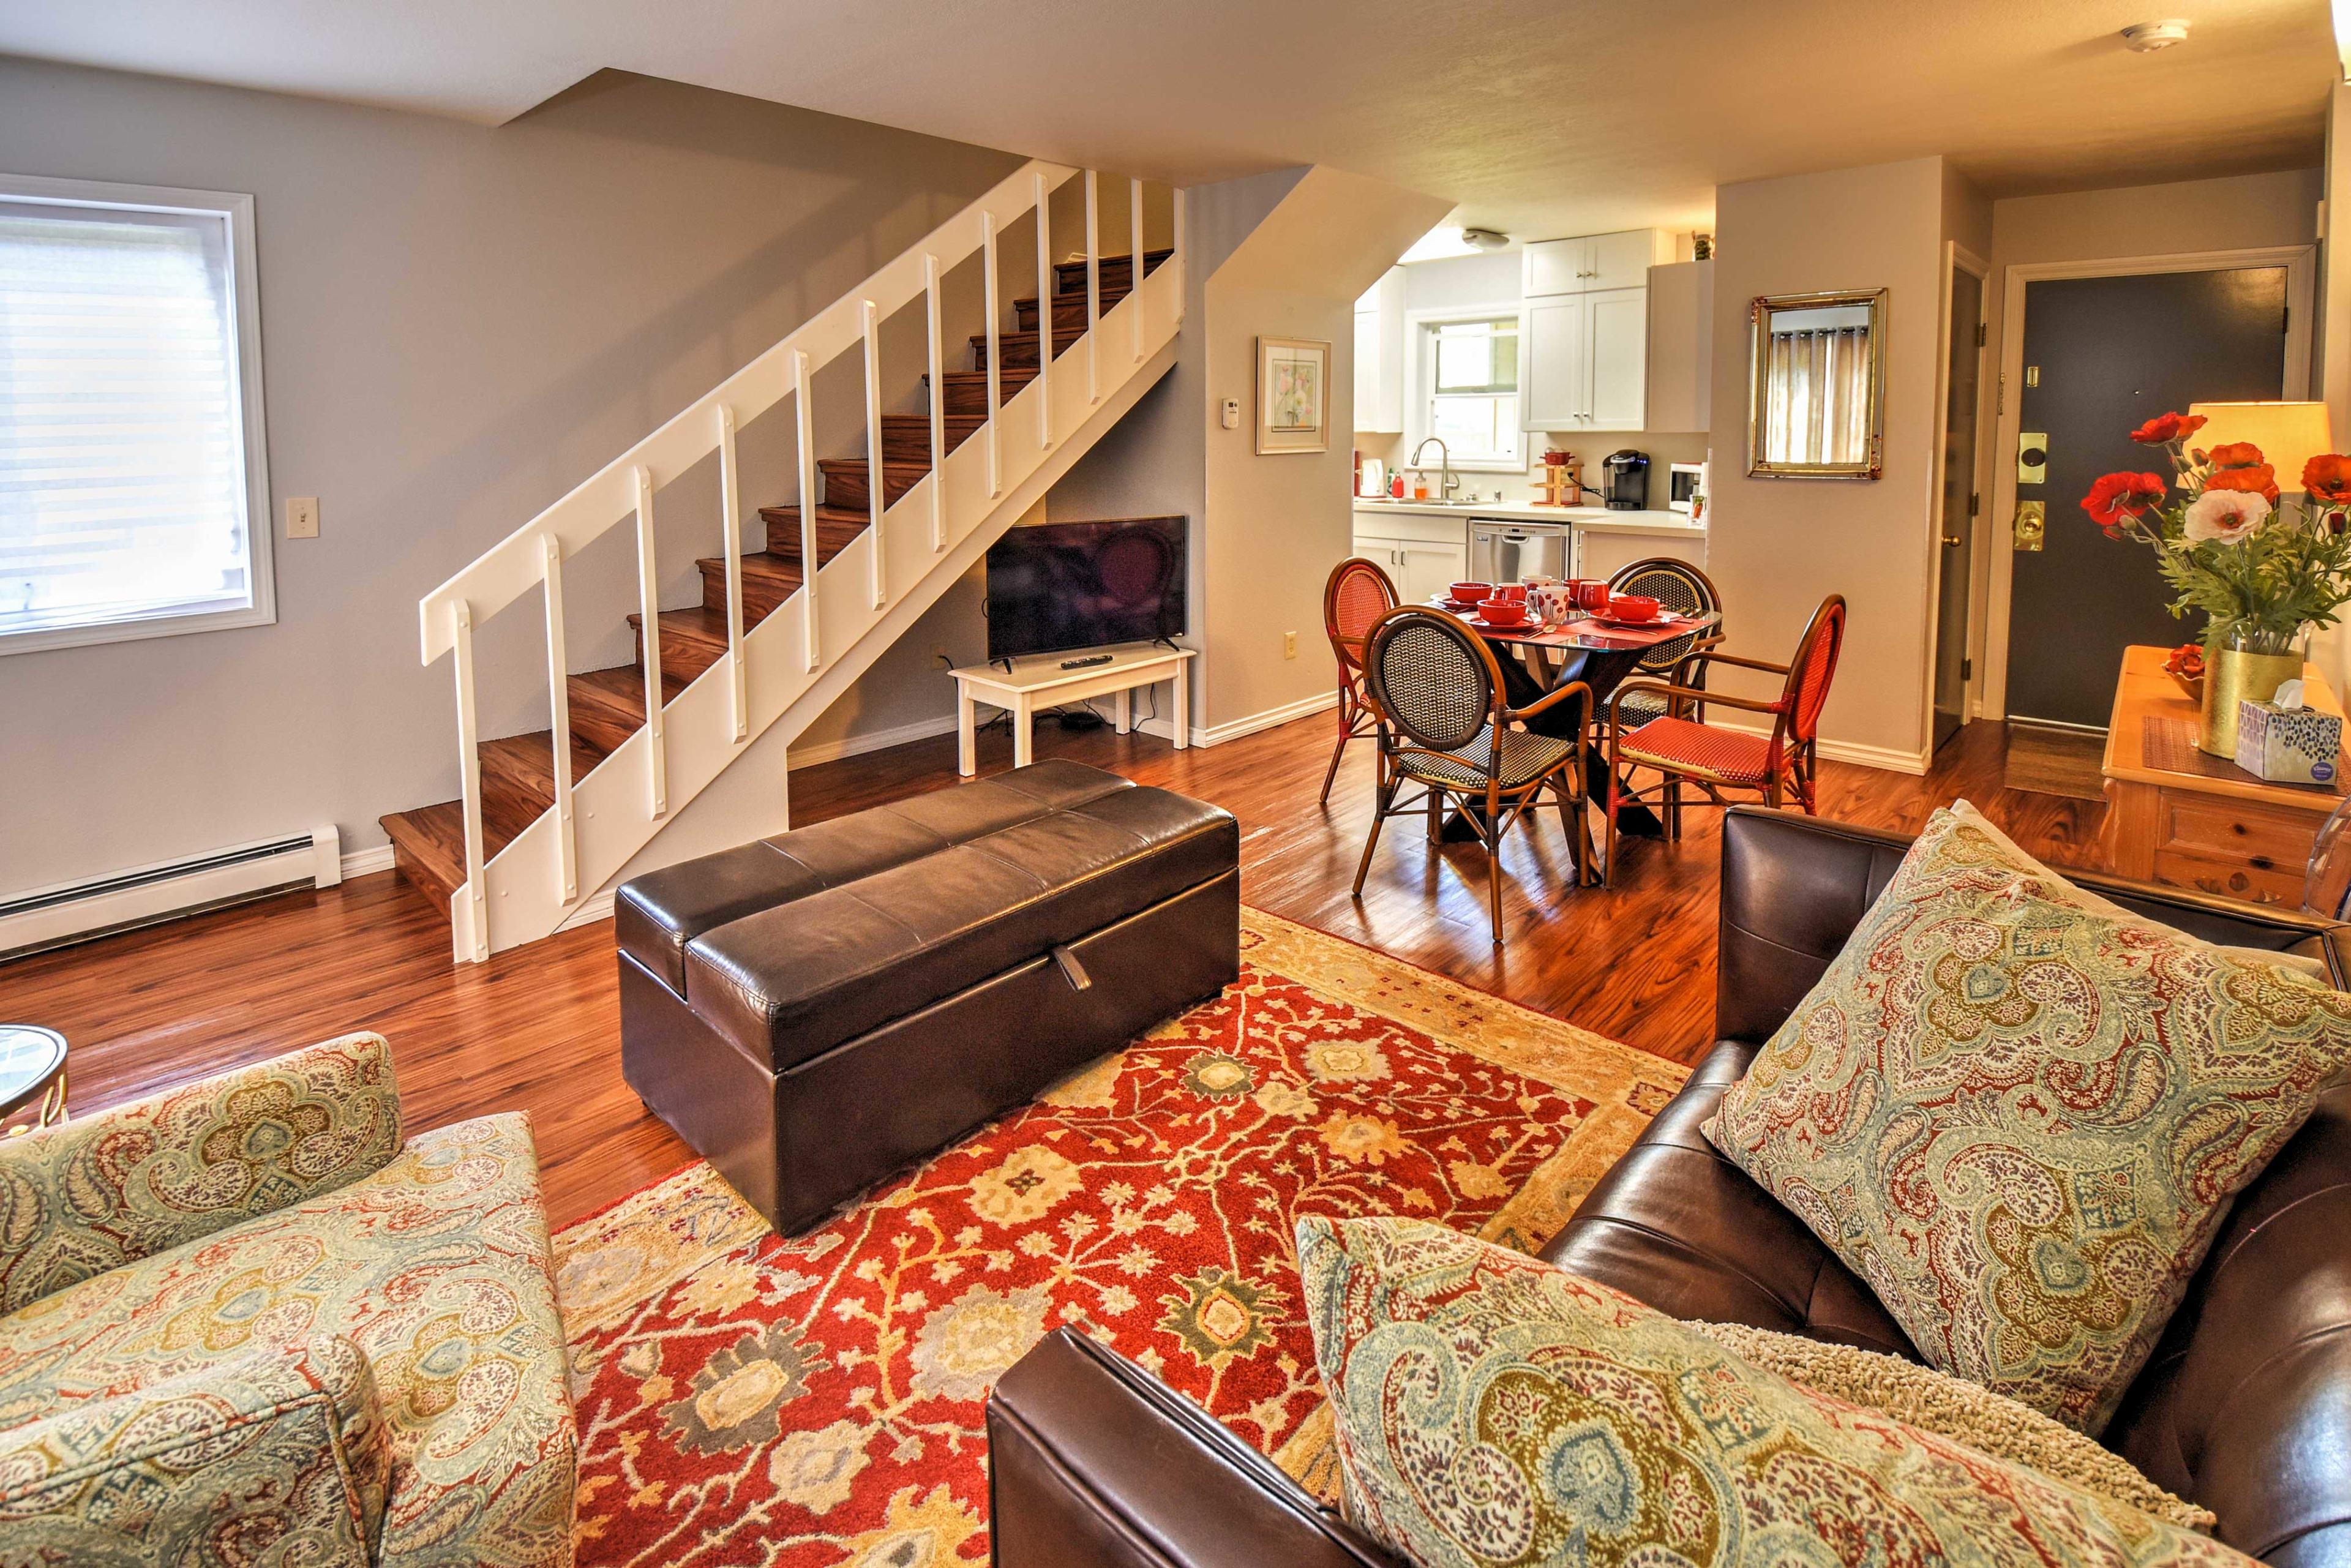 Discover your next Alaska getaway at this vacation rental apartment.